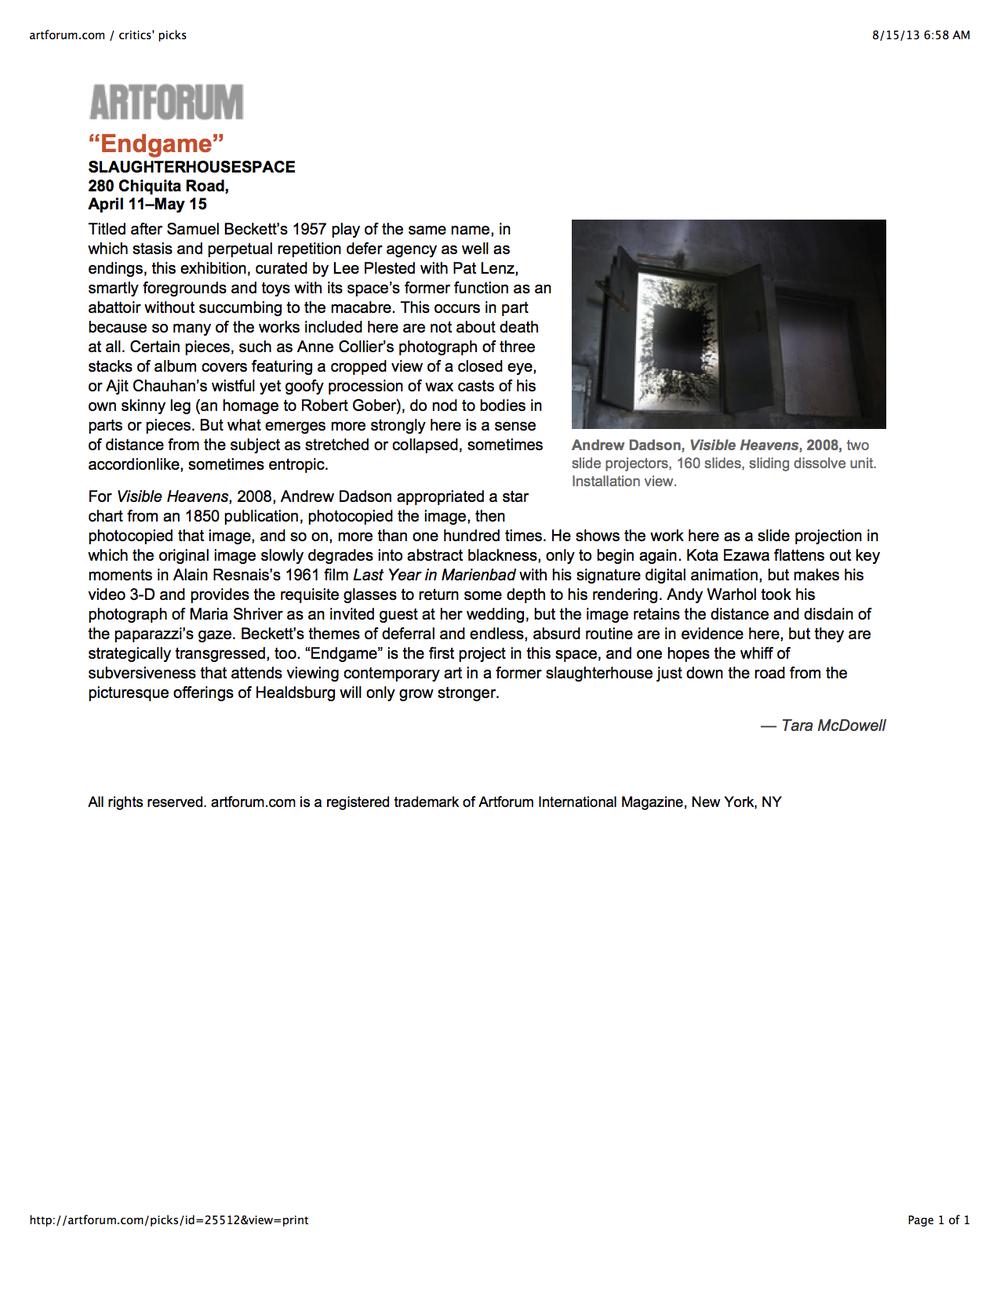 artforum.com : critics' picks.jpg